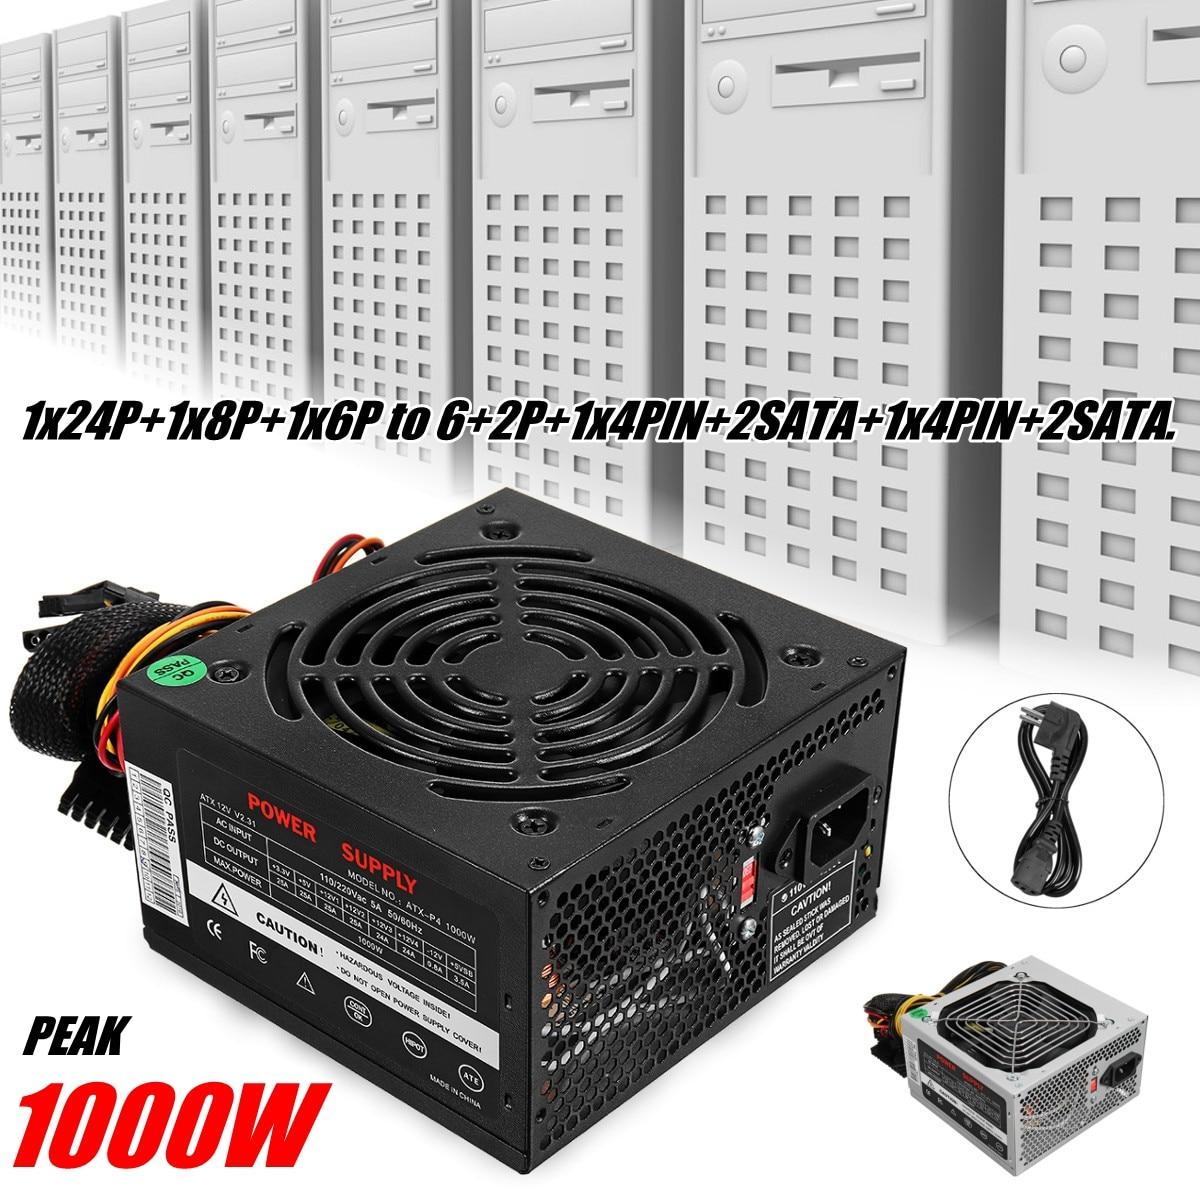 Max 1000W Power Supply PSU PFC Silent Fan ATX 24pin 12V PC Computer SATA Gaming PC Power Supply For Intel AMD Computer